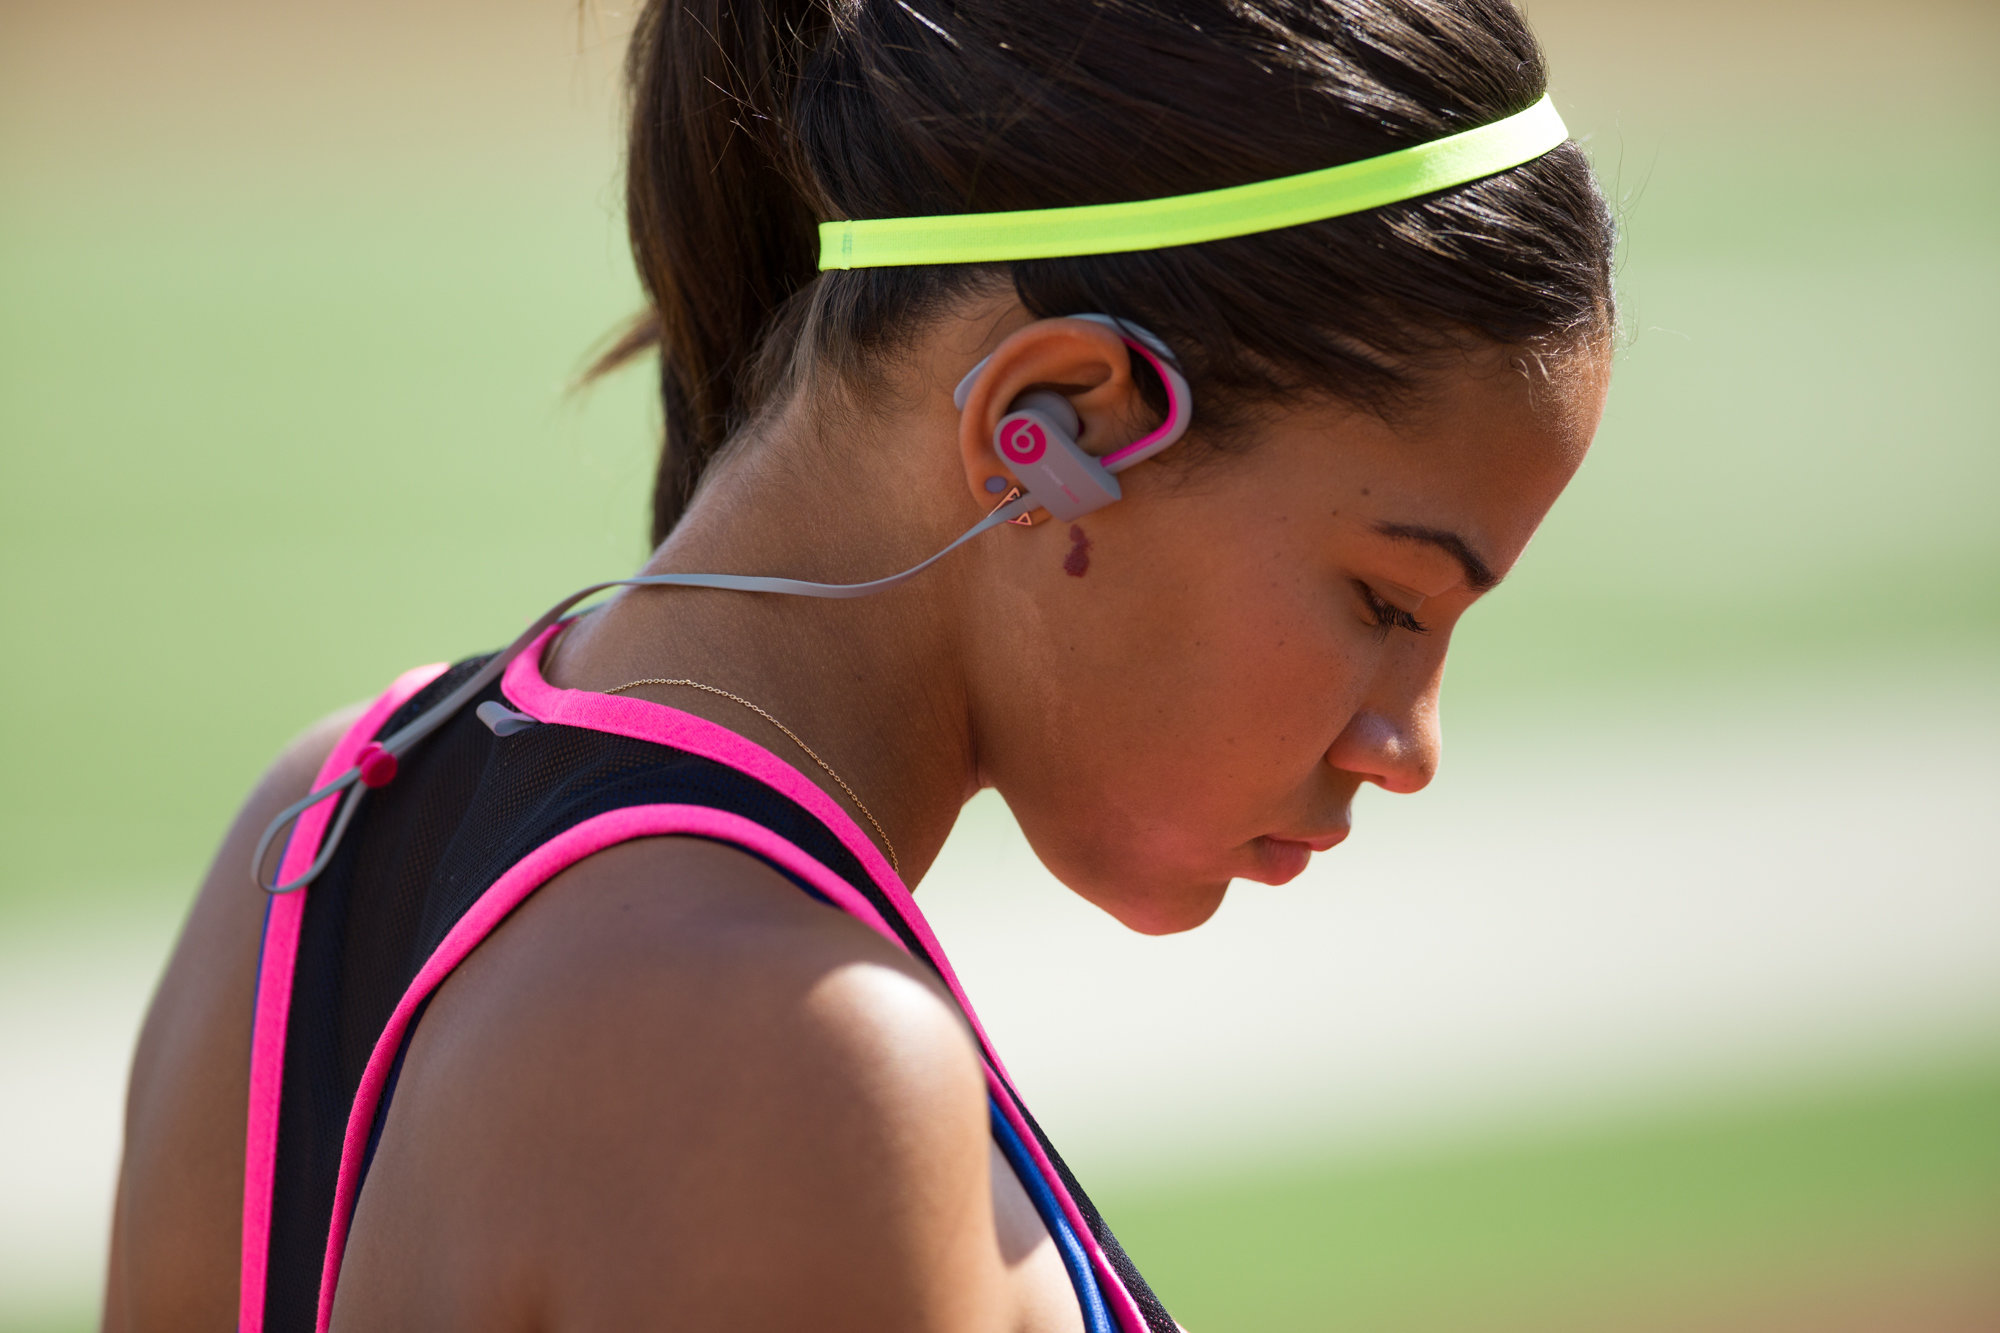 W_Nike_Track^15BTS_0086.jpg